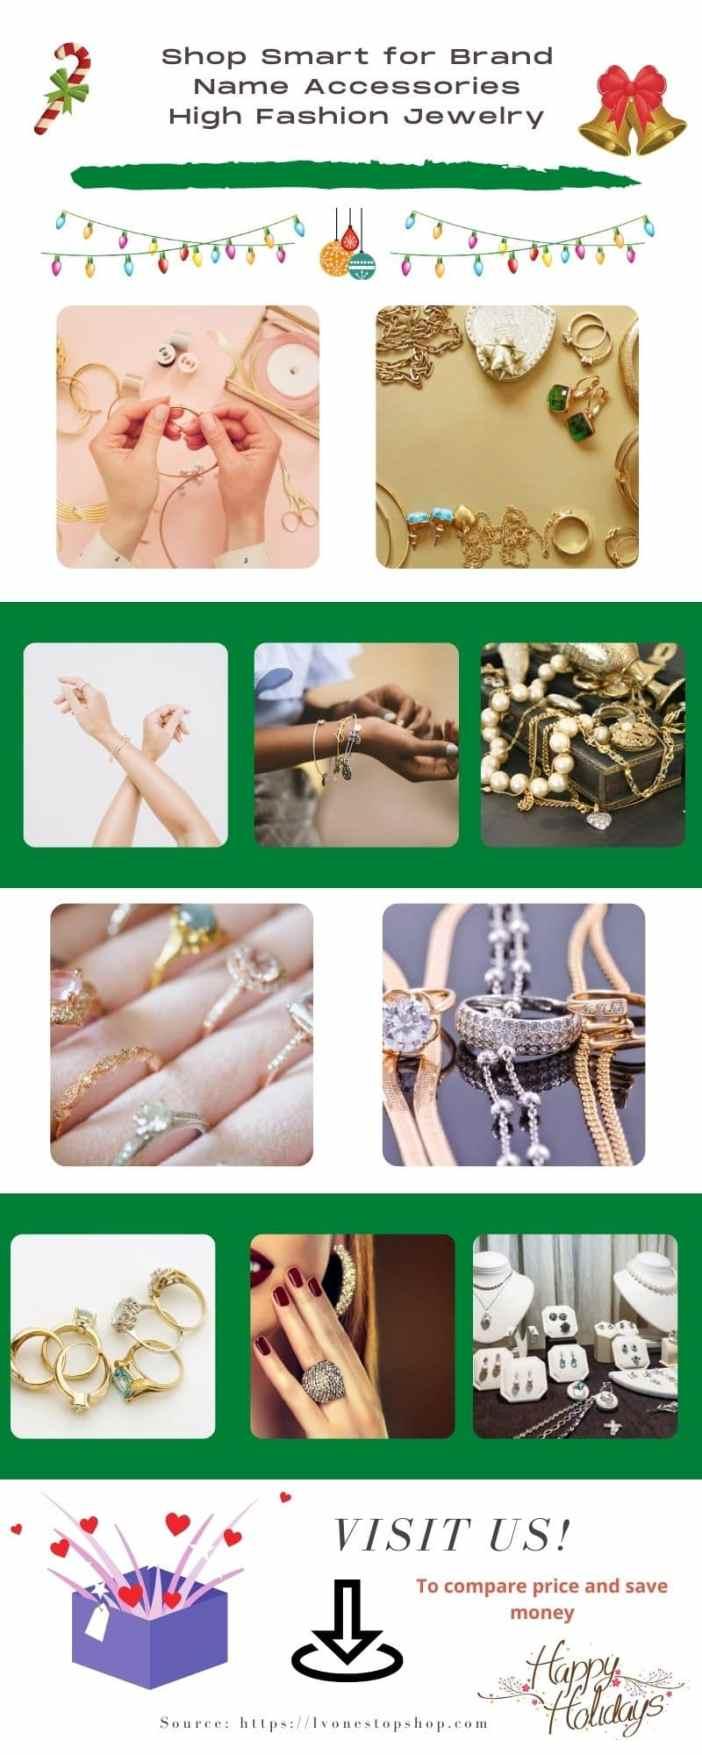 High Fashion Jewelry and shop smart